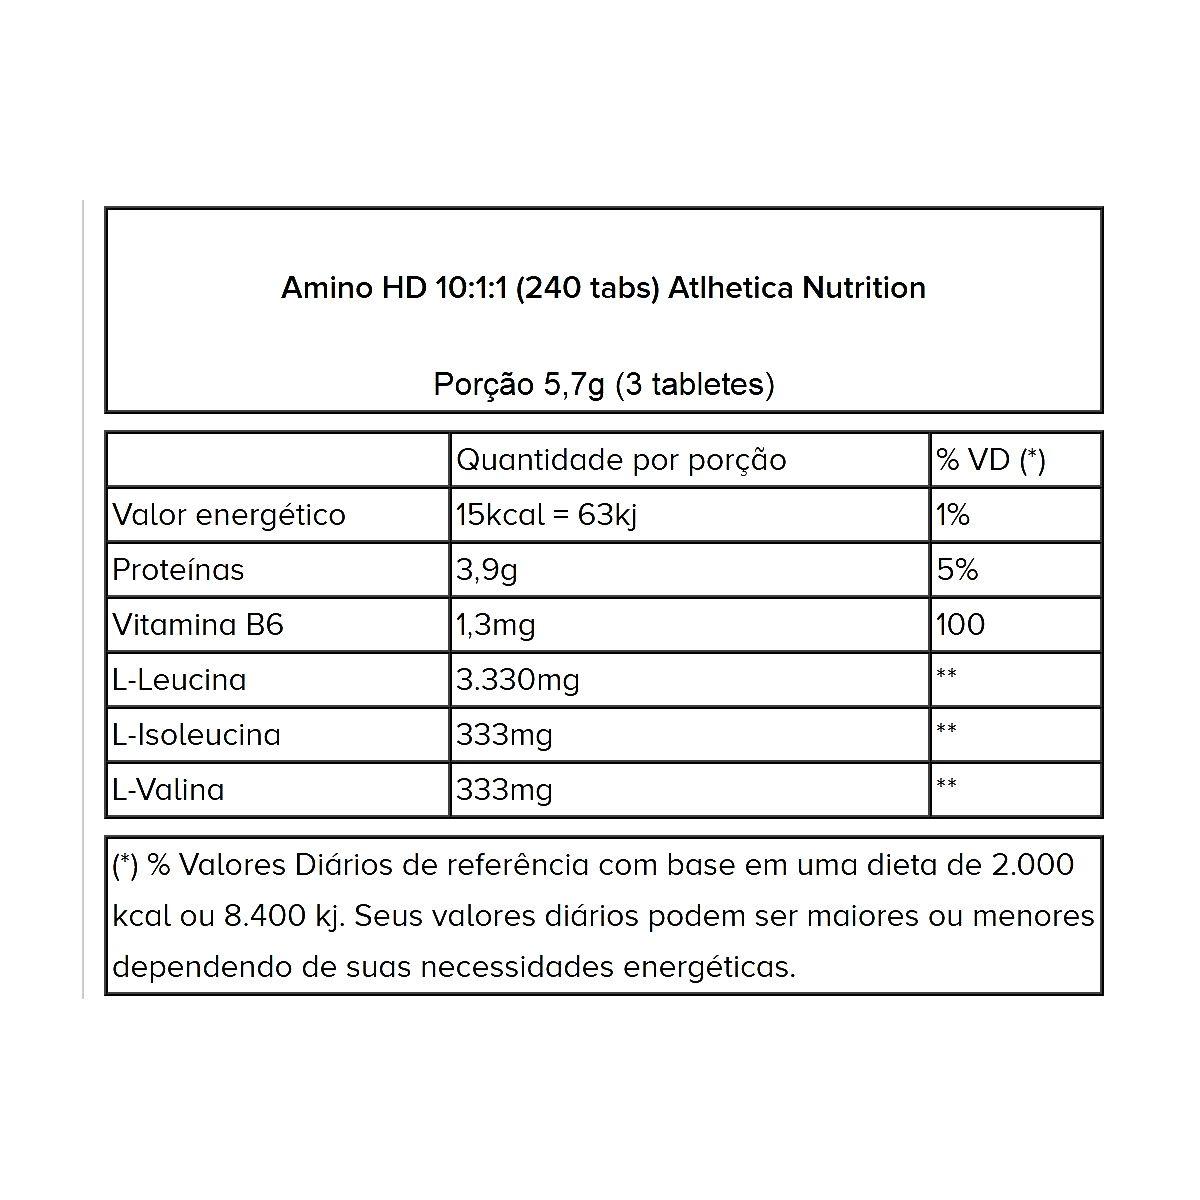 Amino HD 10:1:1 - 240 Tabletes - Atlhetica Nutrition